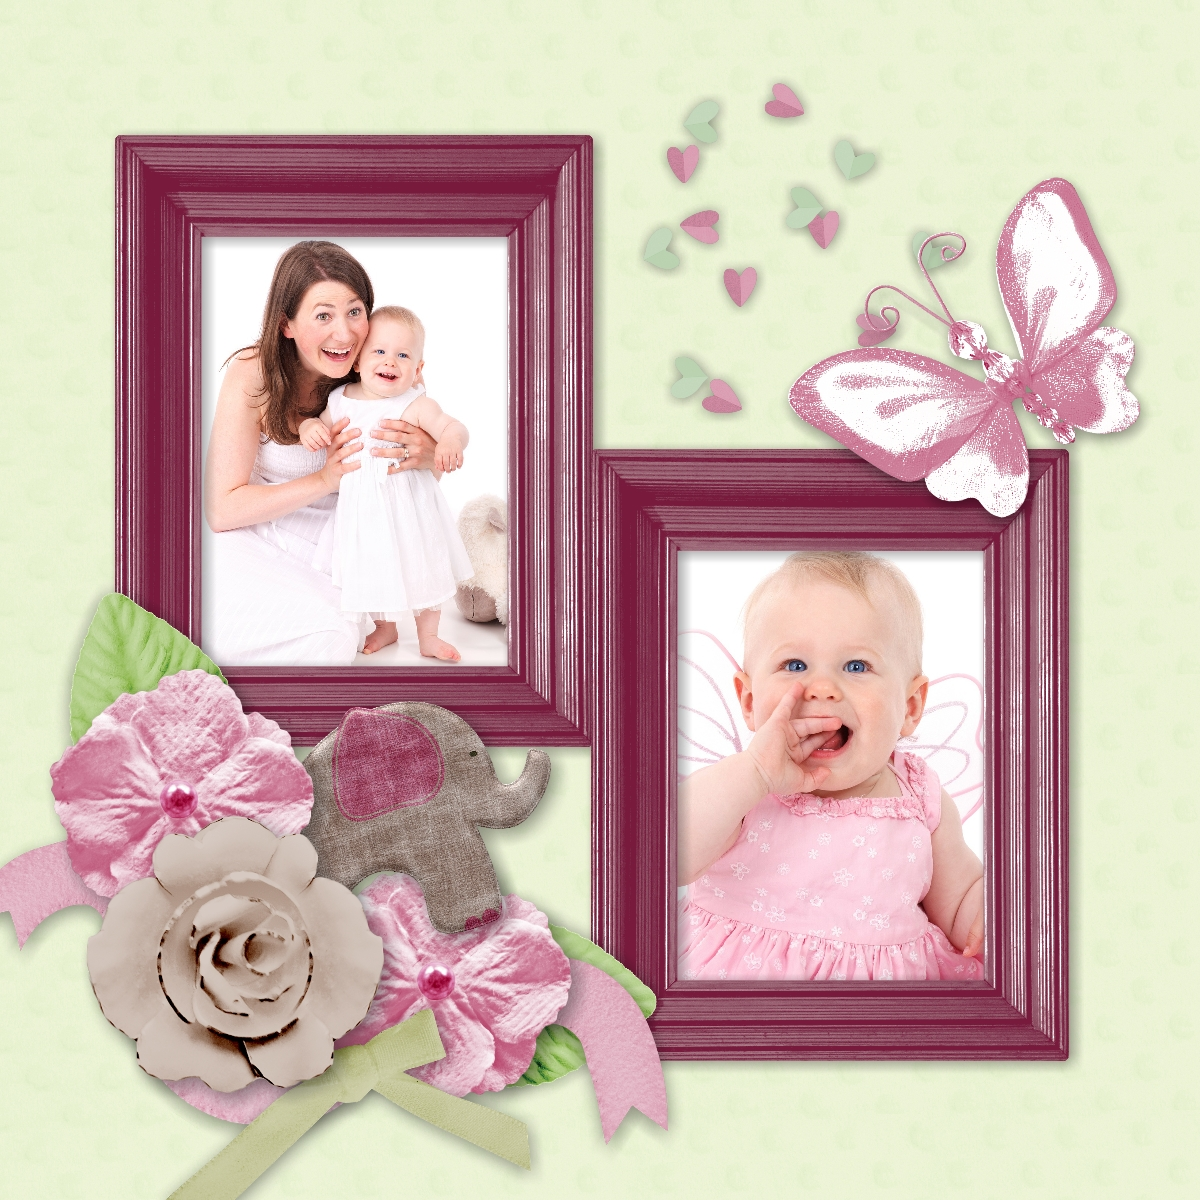 Sweet Baby Emma PB 12x12-004.jpg